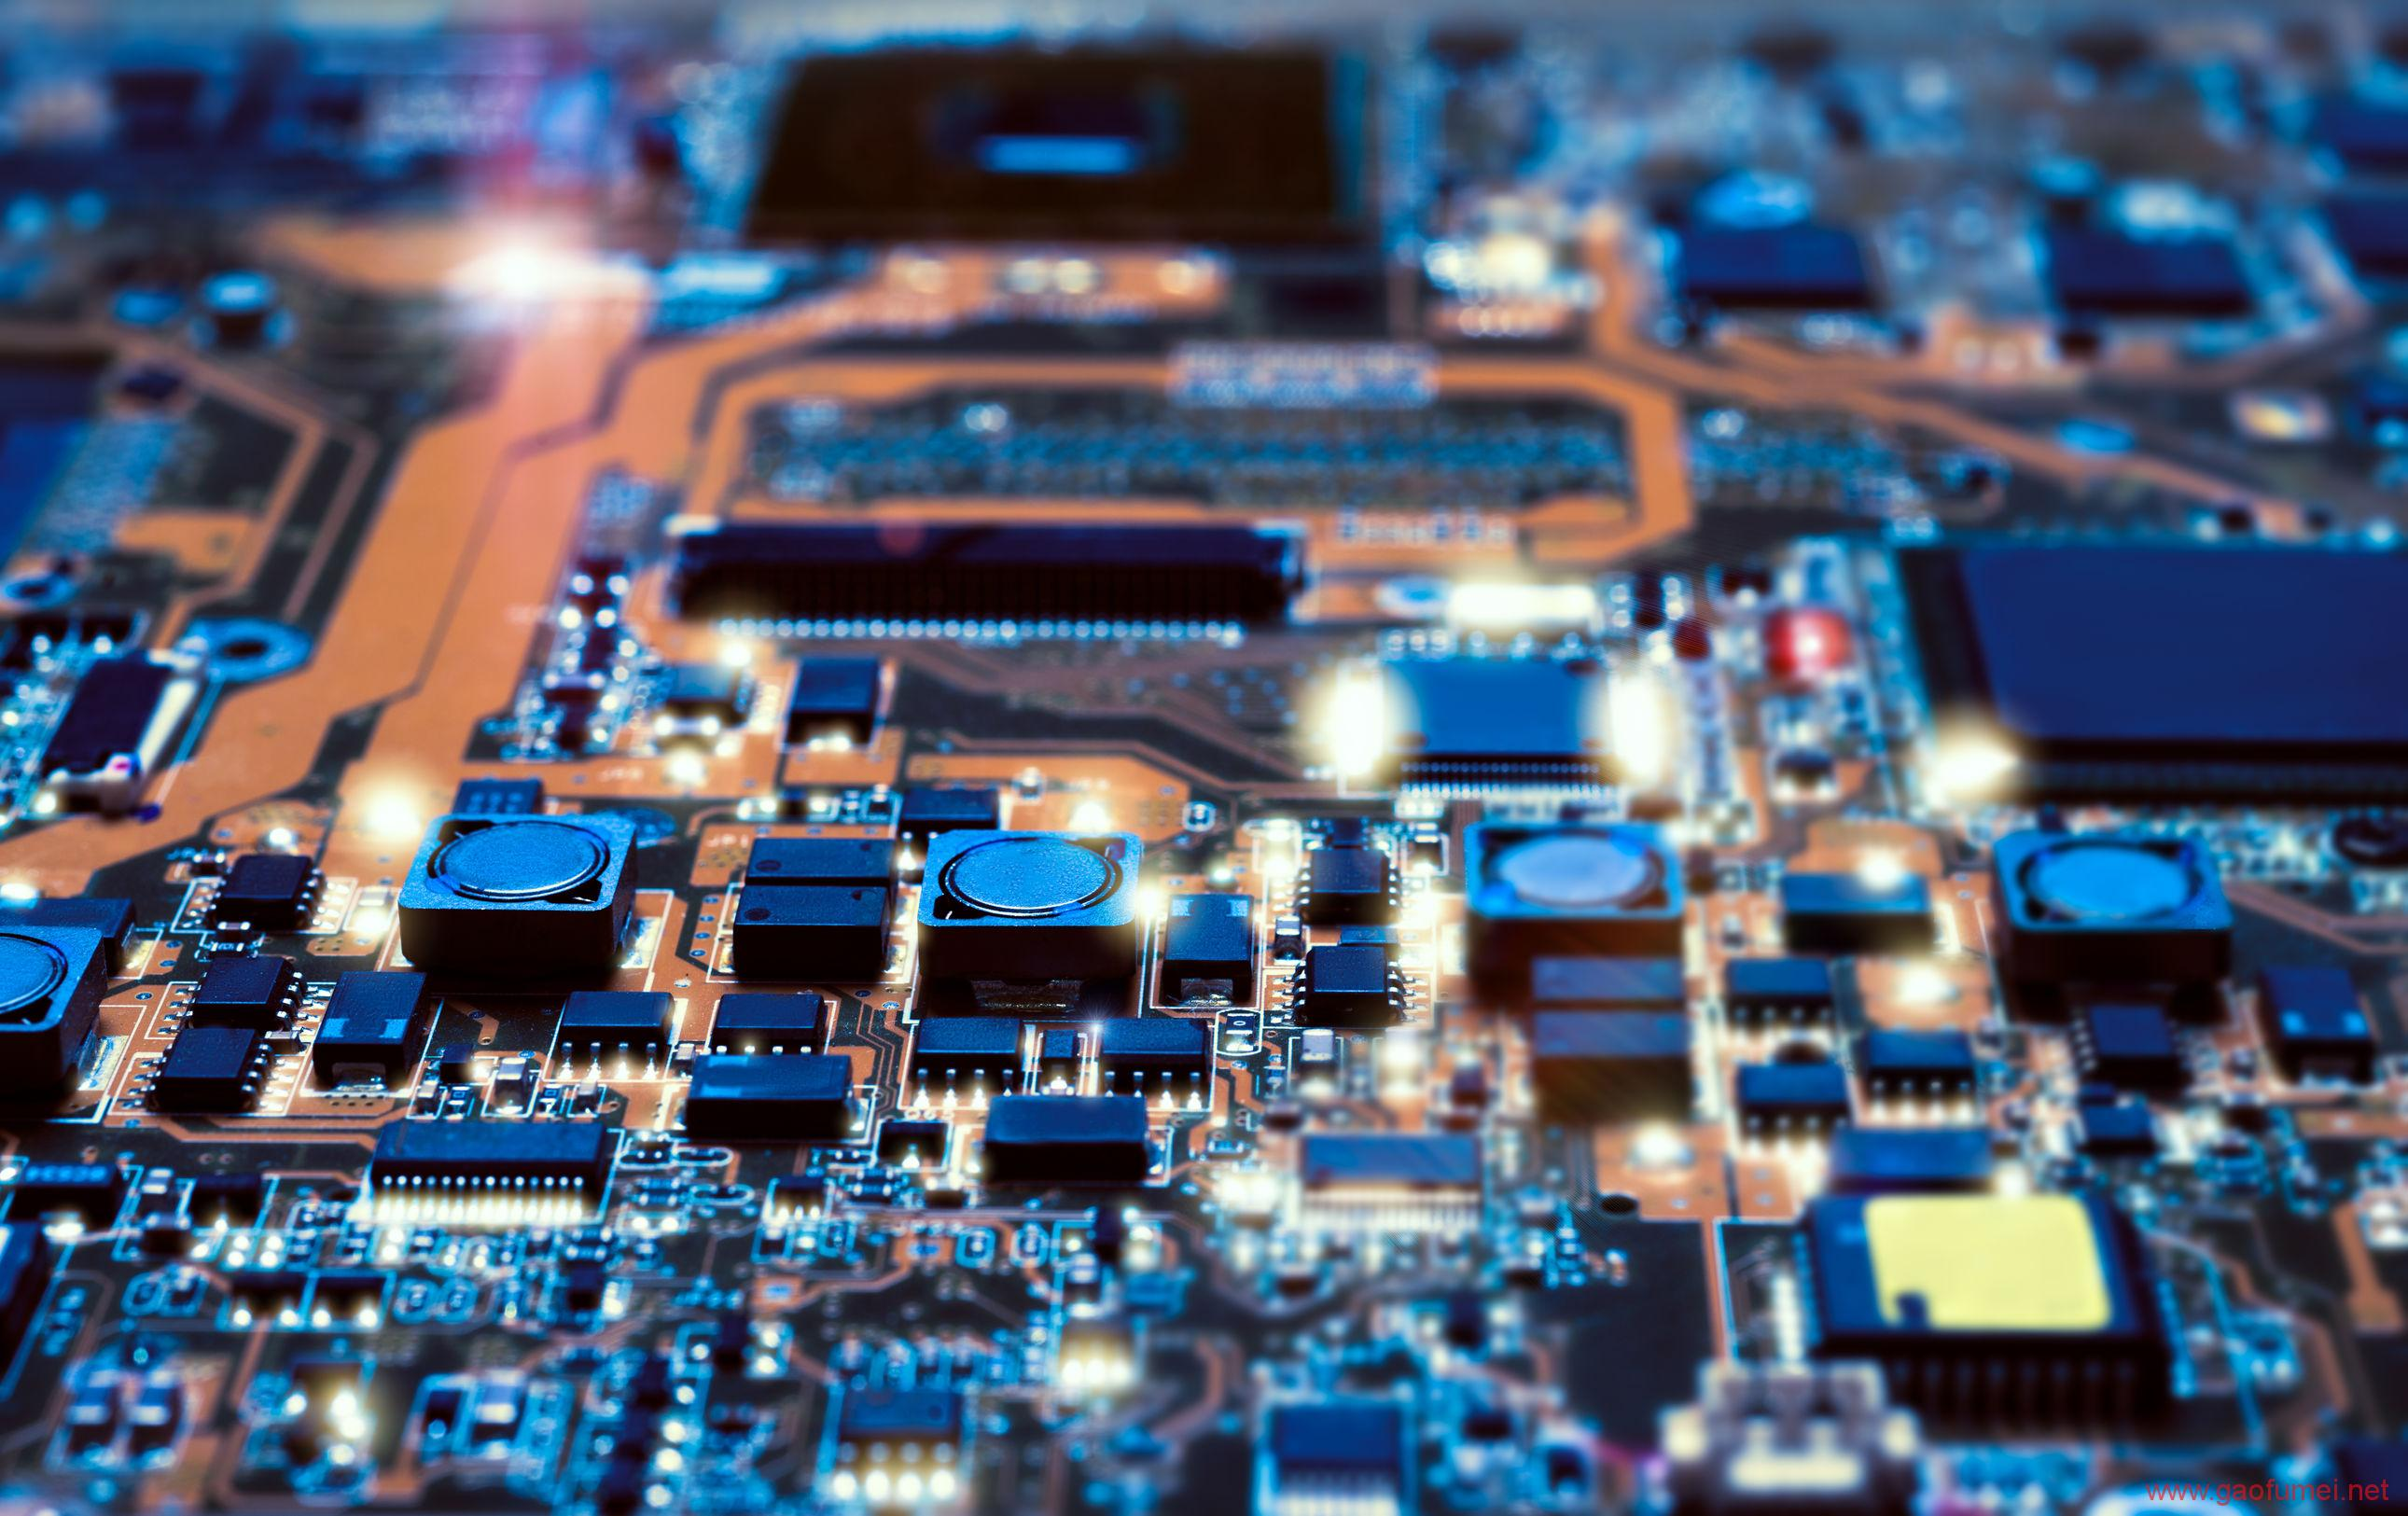 Efinix获950万美元风险投资华人执掌的芯片公司同巨头抢地盘